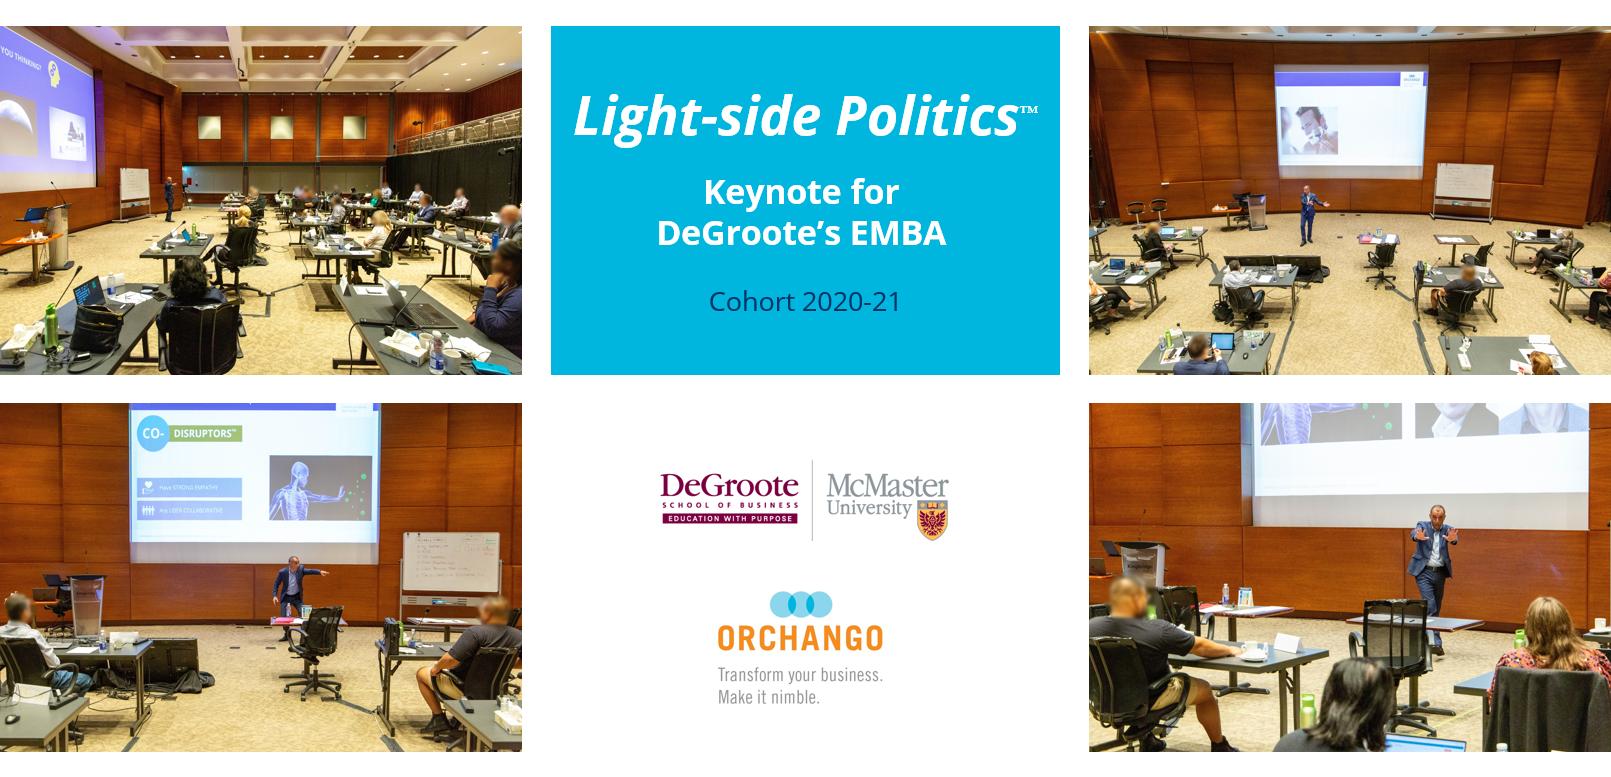 Pictures Of Edmond Mellina Delivering His Light-side Politics Keynote For DeGroote EMBA 2020-21